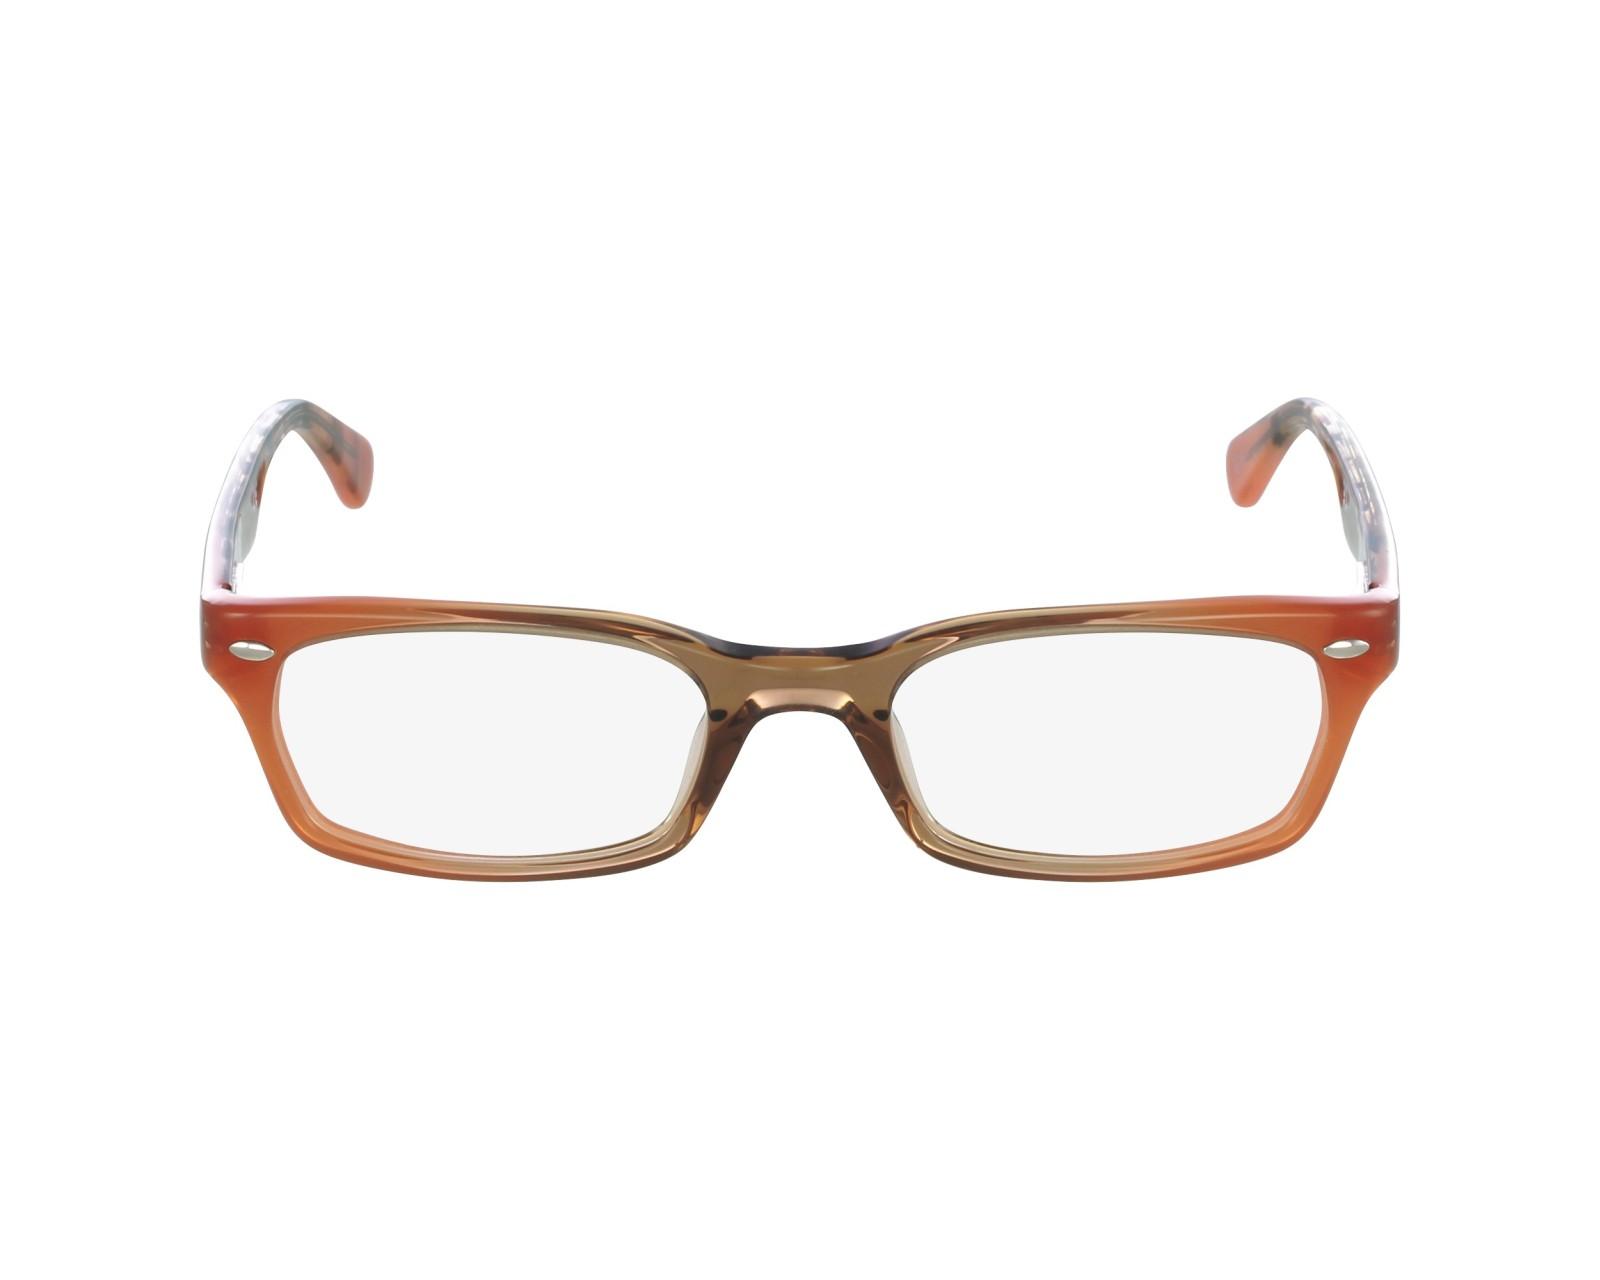 92dc111a093 Ray Ban Eyeglasses Rx5150 « Heritage Malta